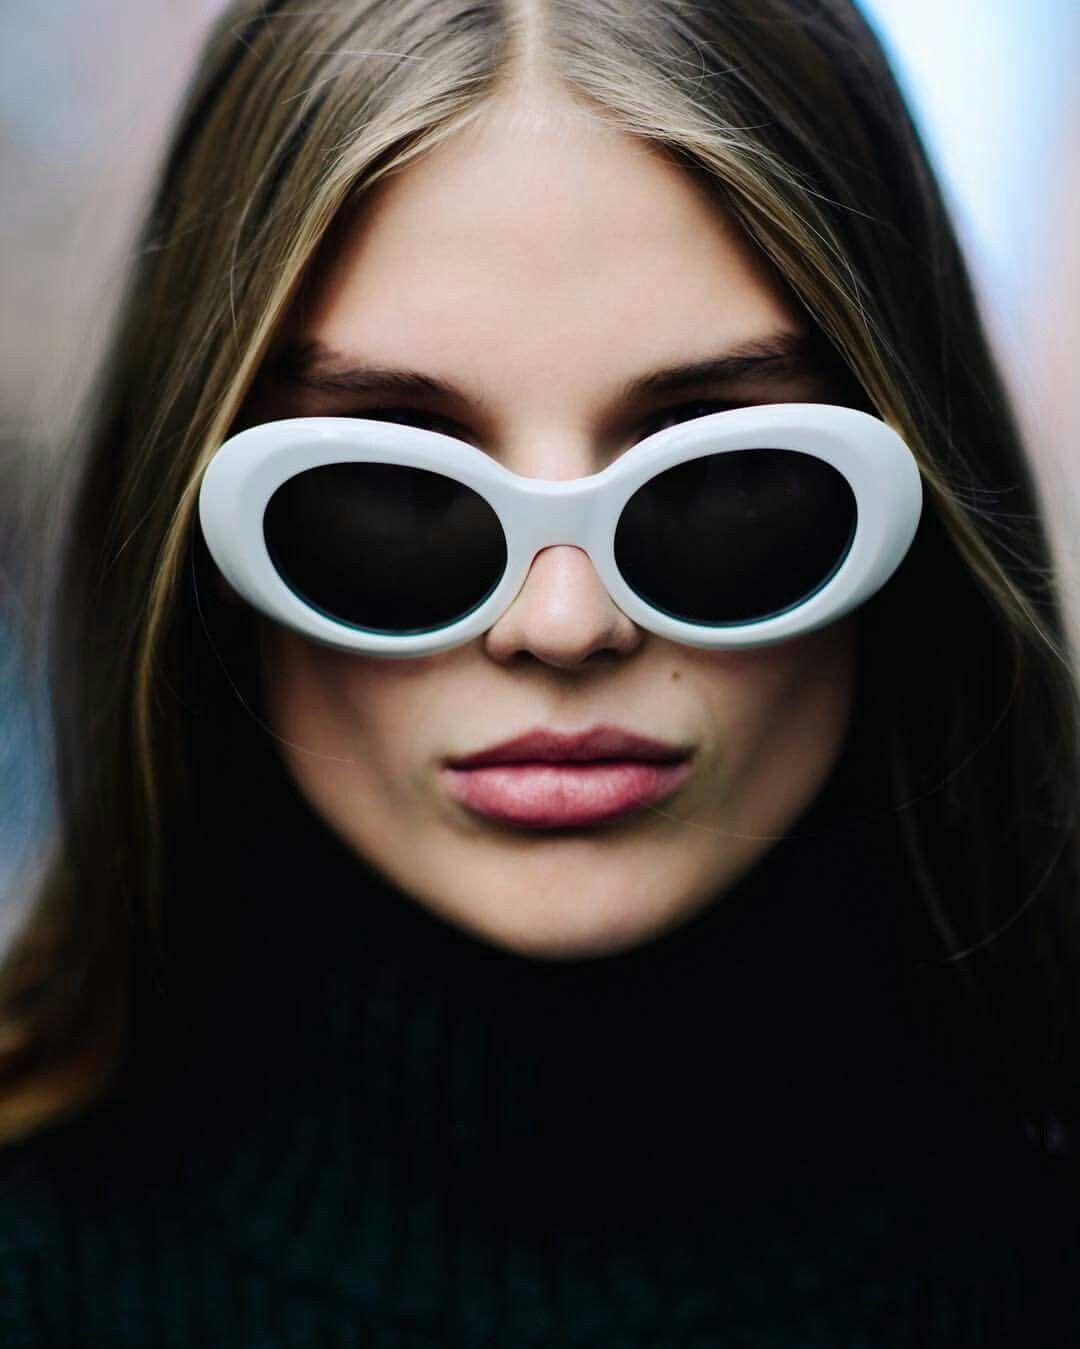 Pin by jennyanne jett on lunettes pinterest sunshine